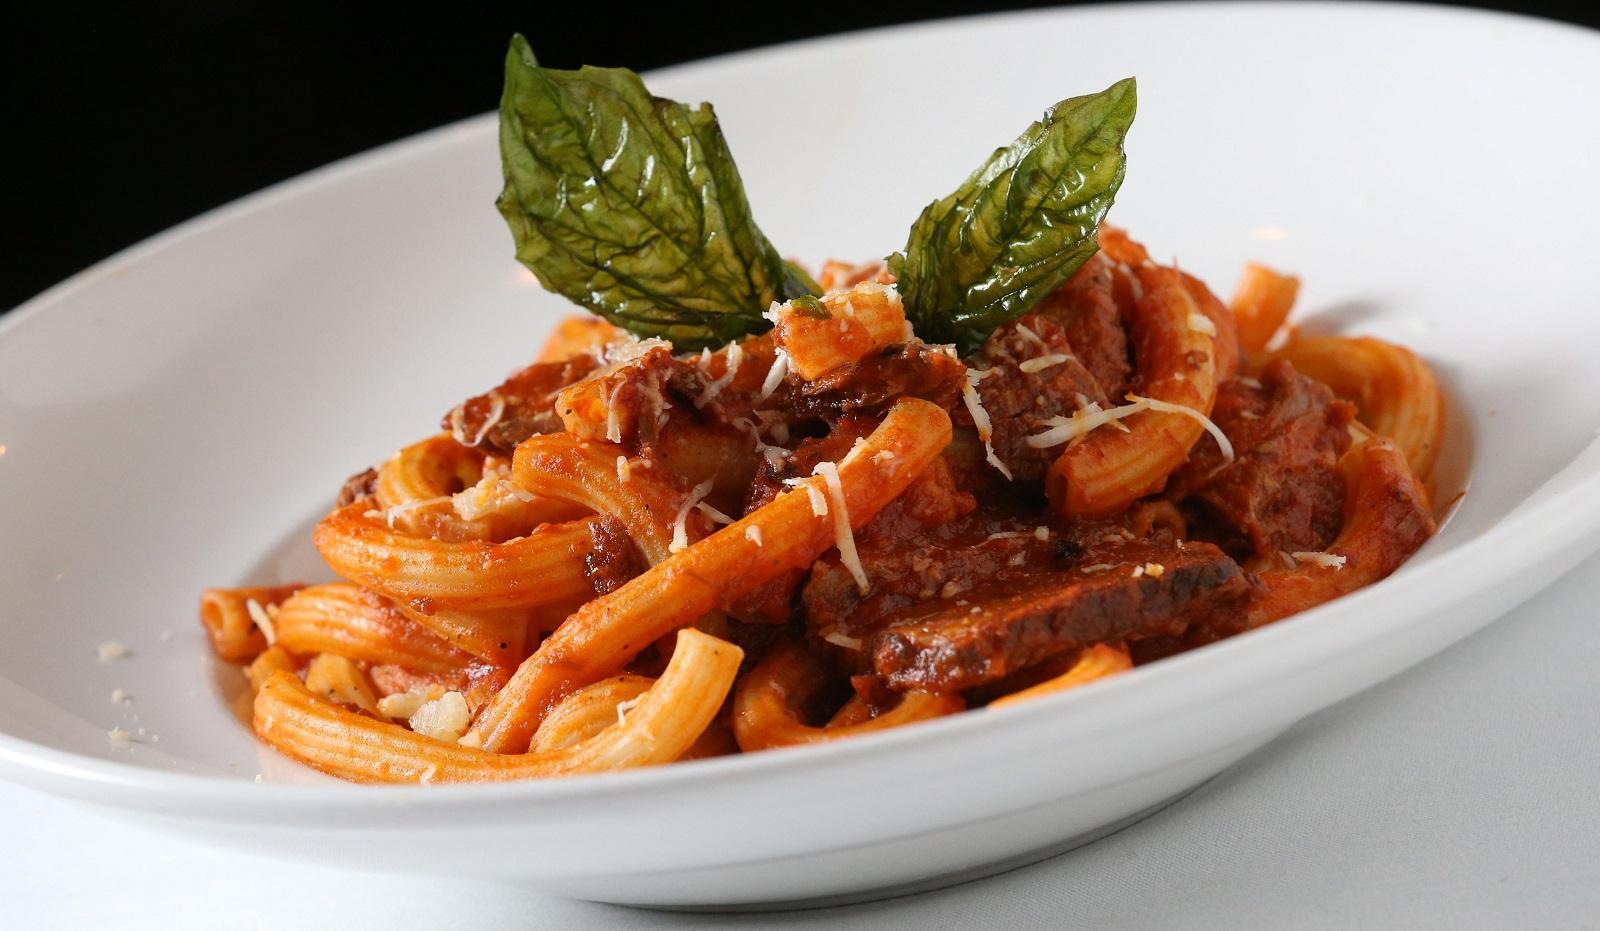 Housemade pastas, like Rizotto's maccarancini with a short rib ragu, remain. (Sharon Cantillon/Buffalo News)